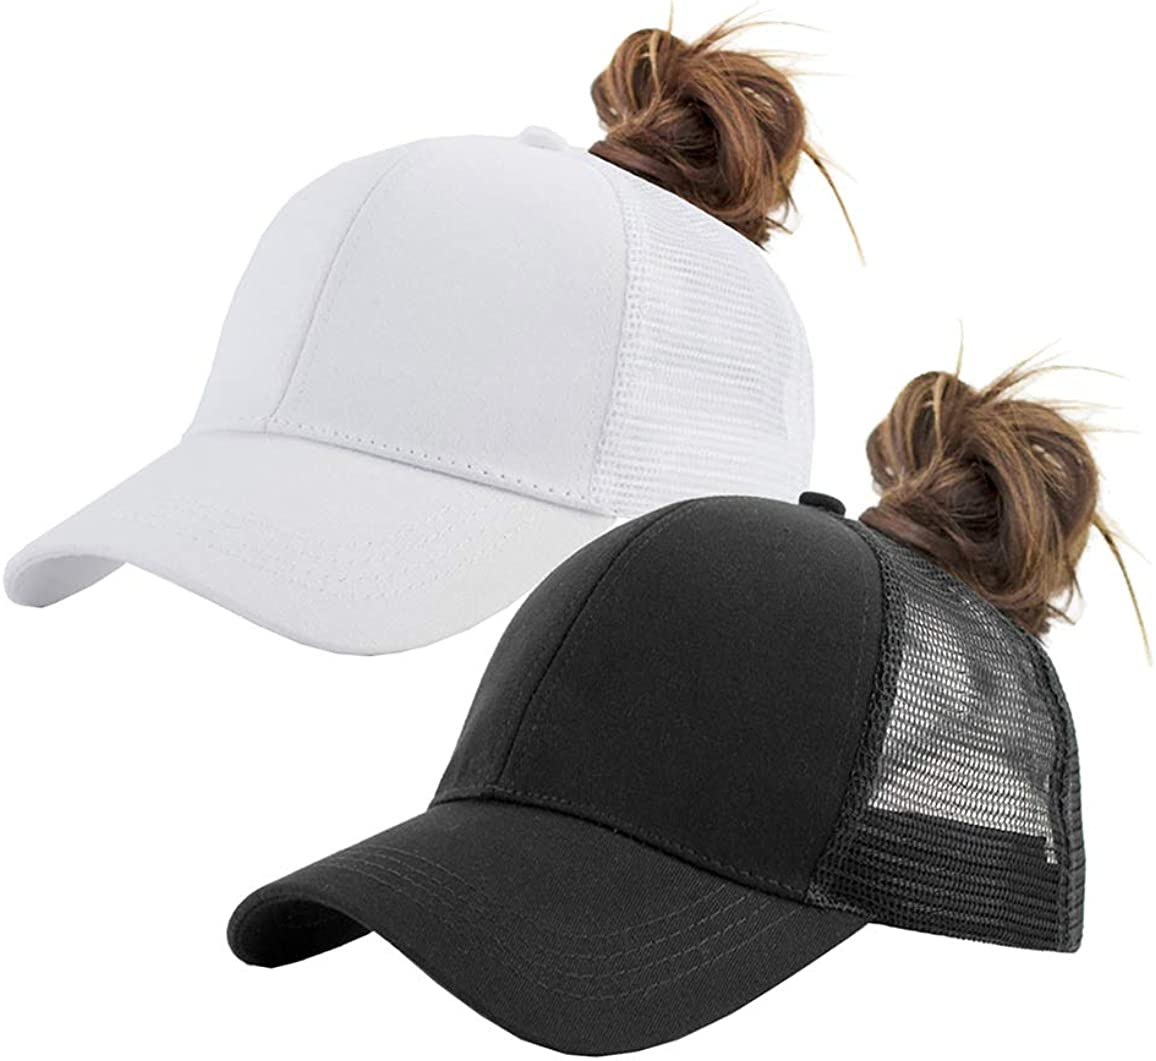 Solid Ponytail Hat Baseball Cap Cotton Mesh High Bun Pony Cap Women 56-58cm (22